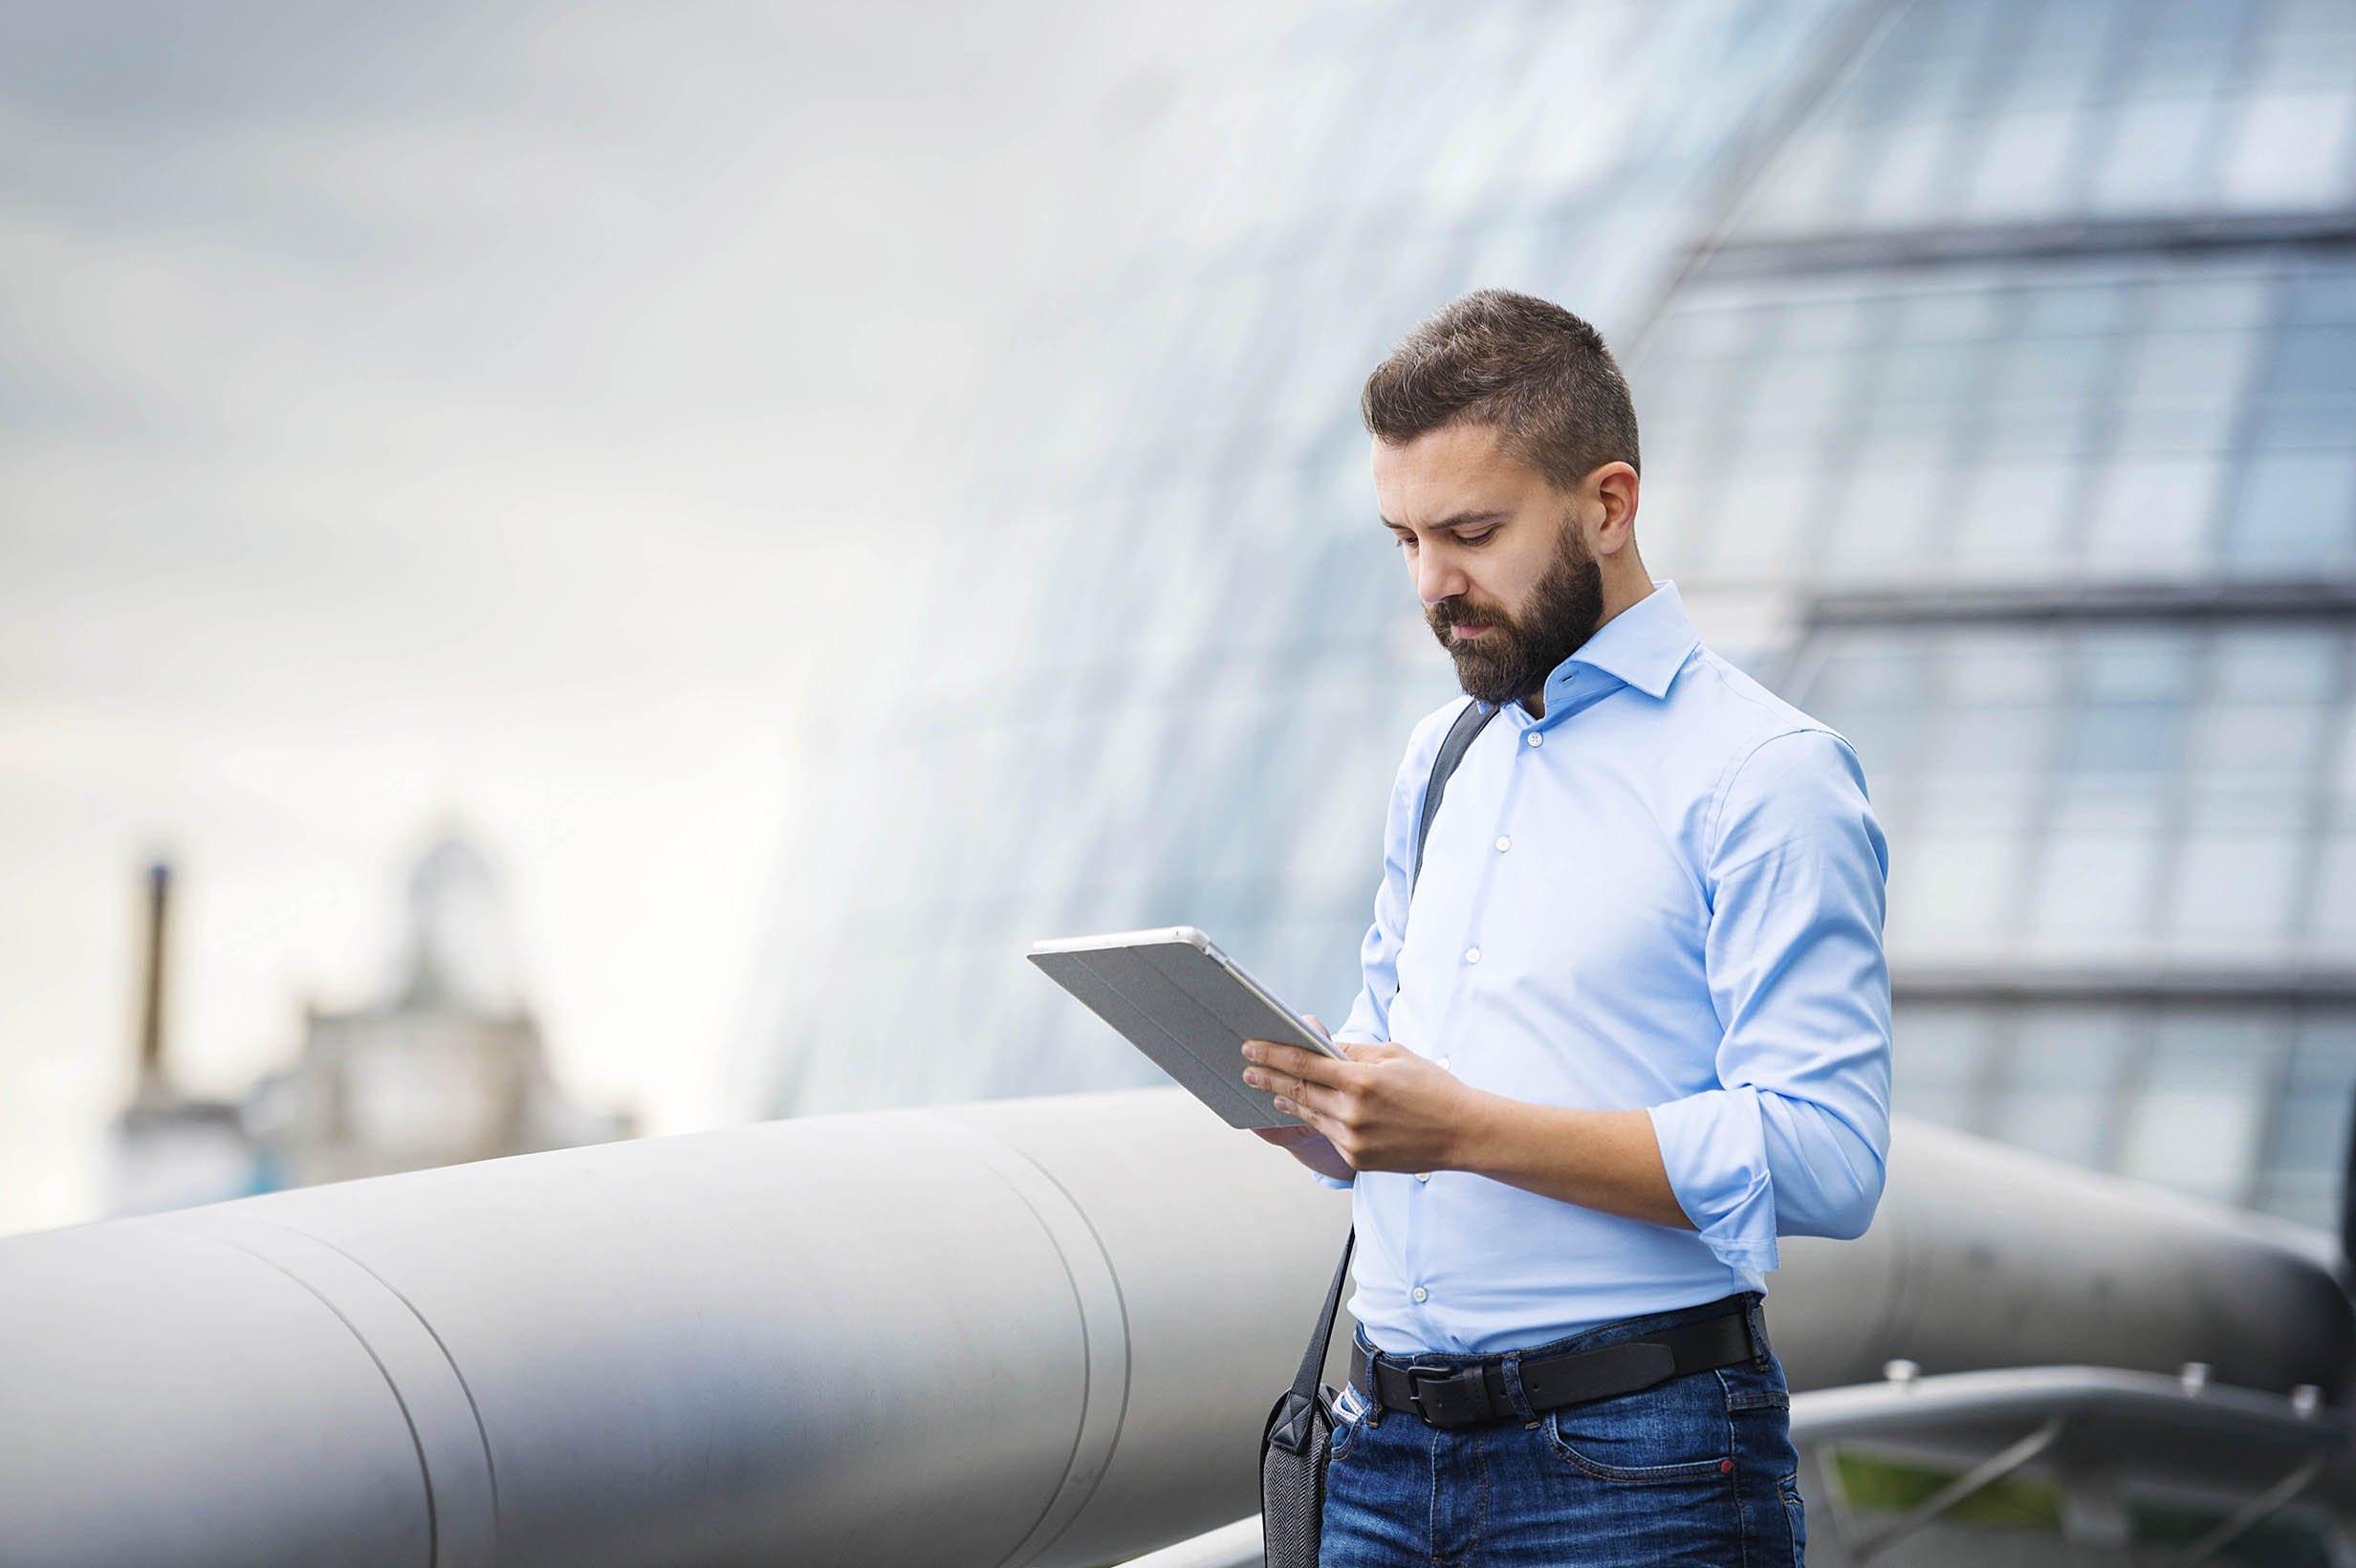 Businesss Transformation Moblie Data Management